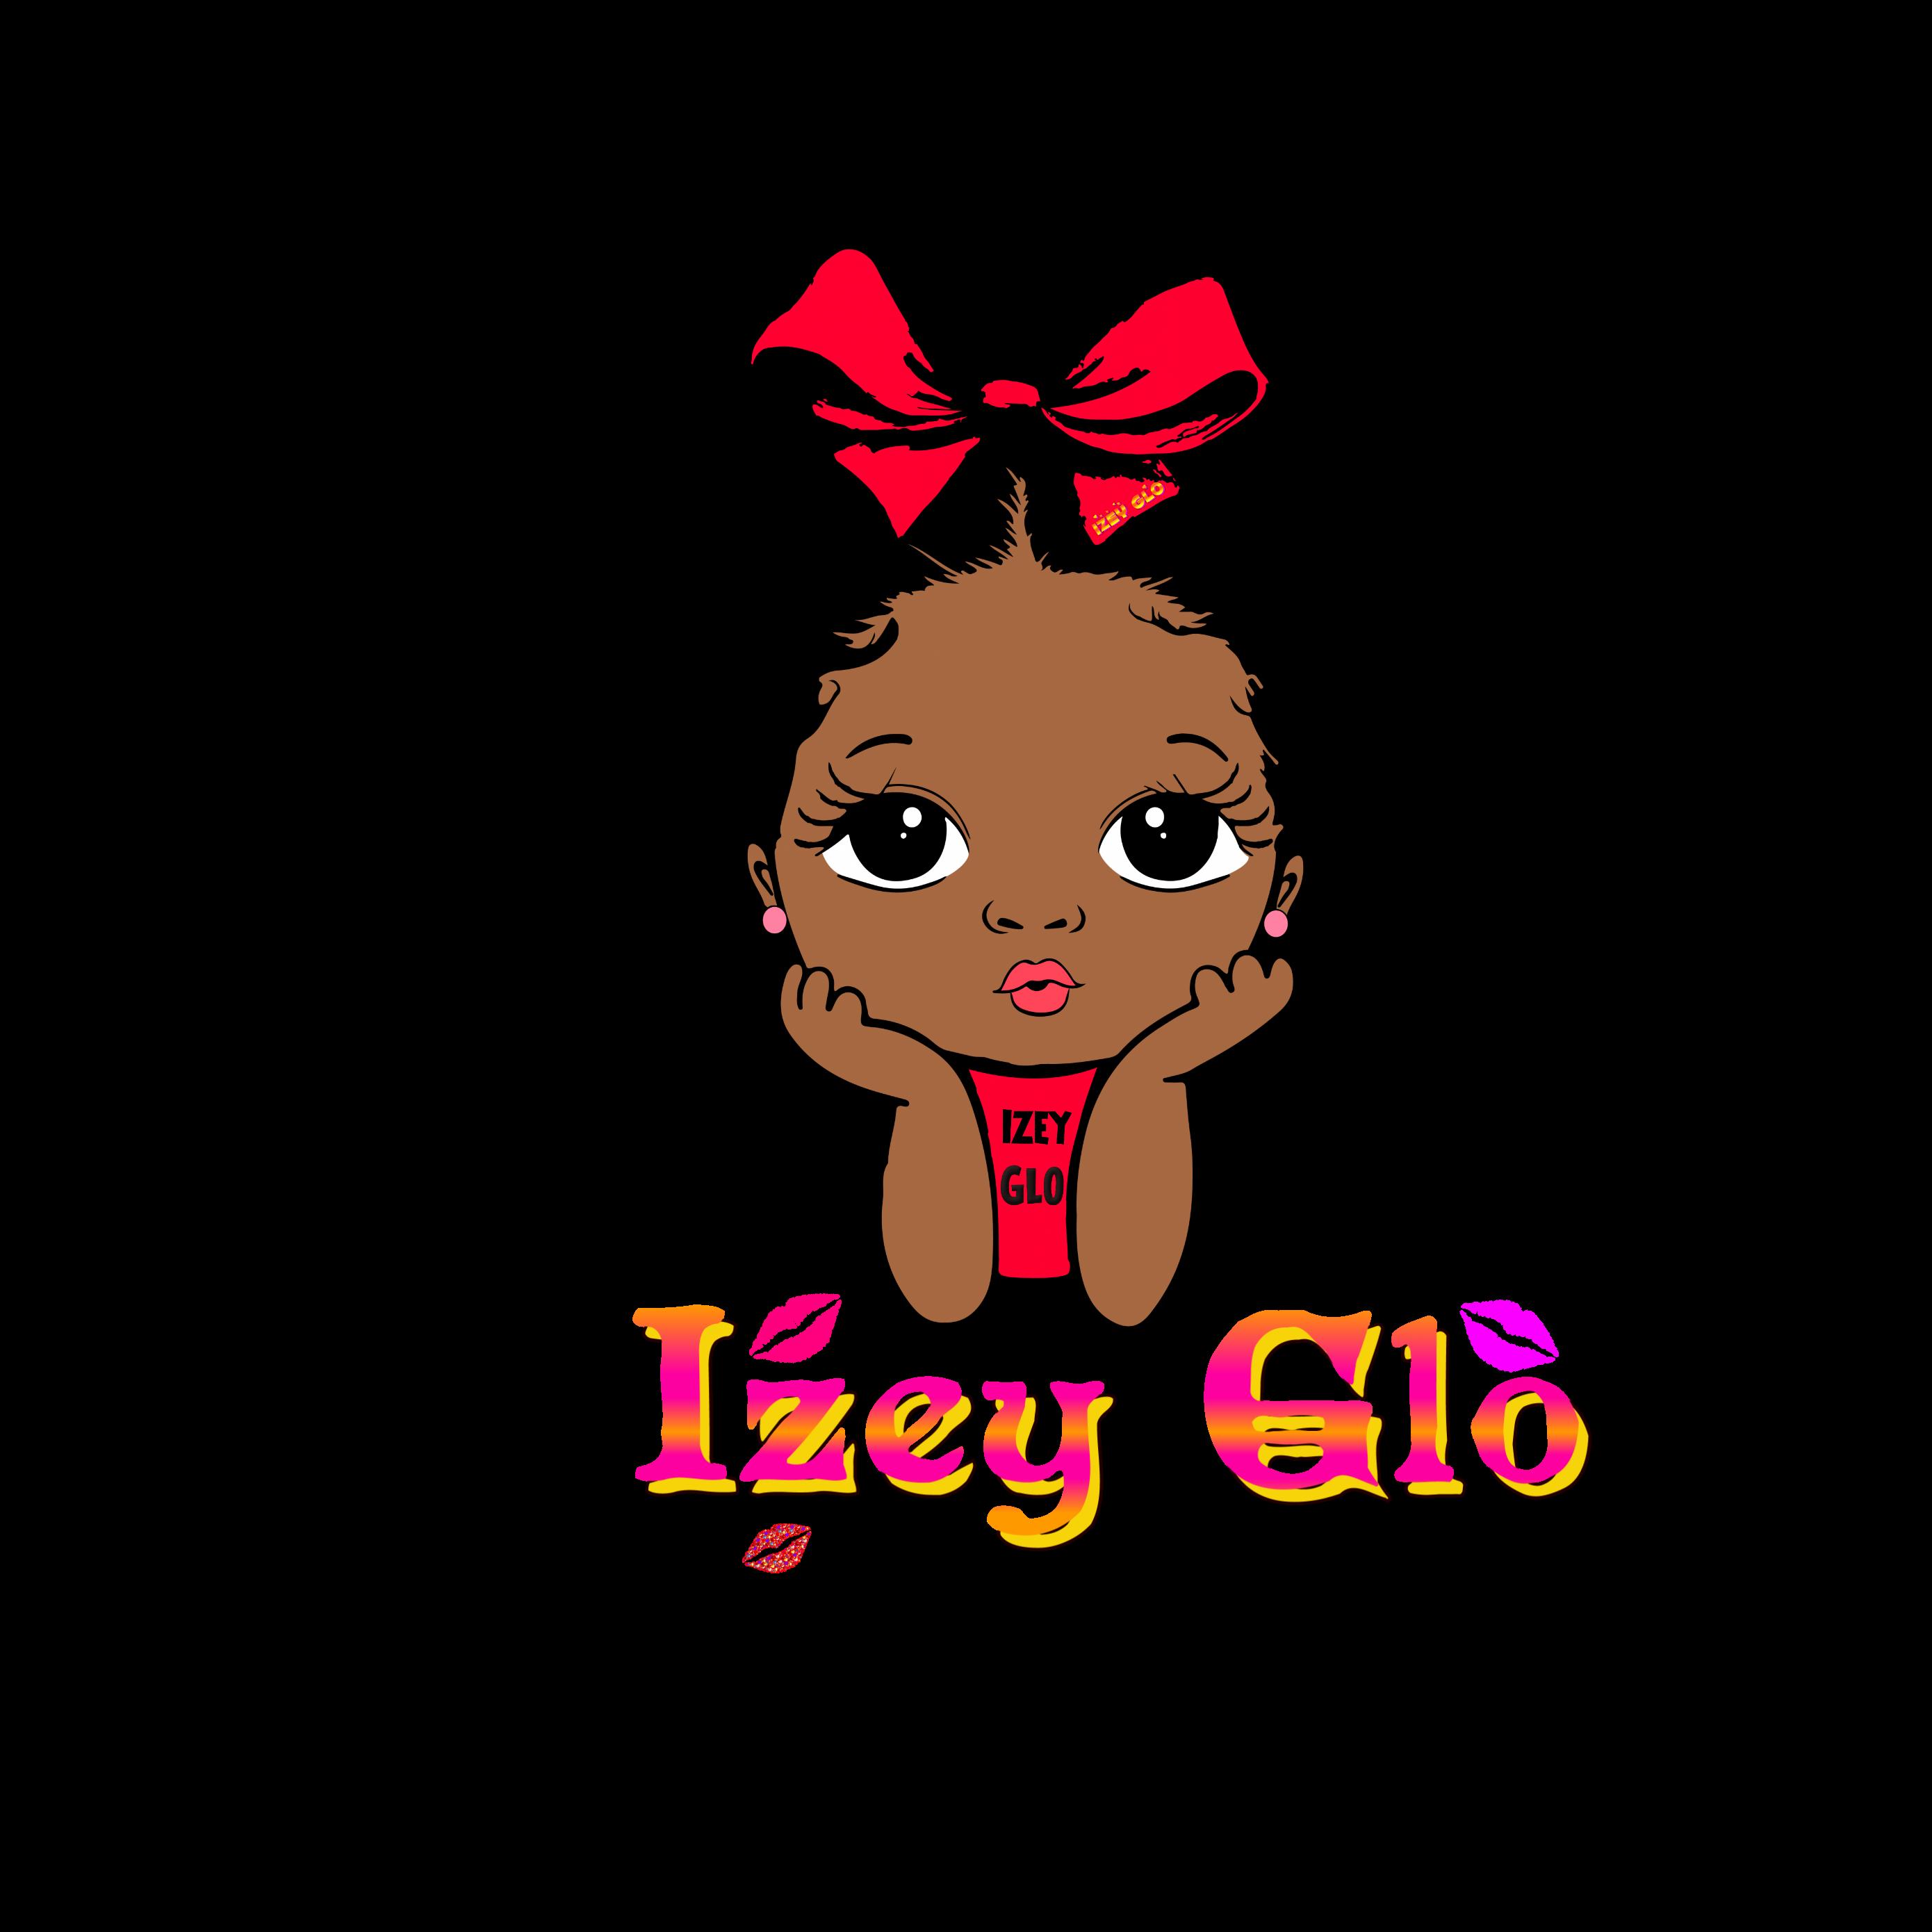 @IzeyGlo Profile Image | Linktree